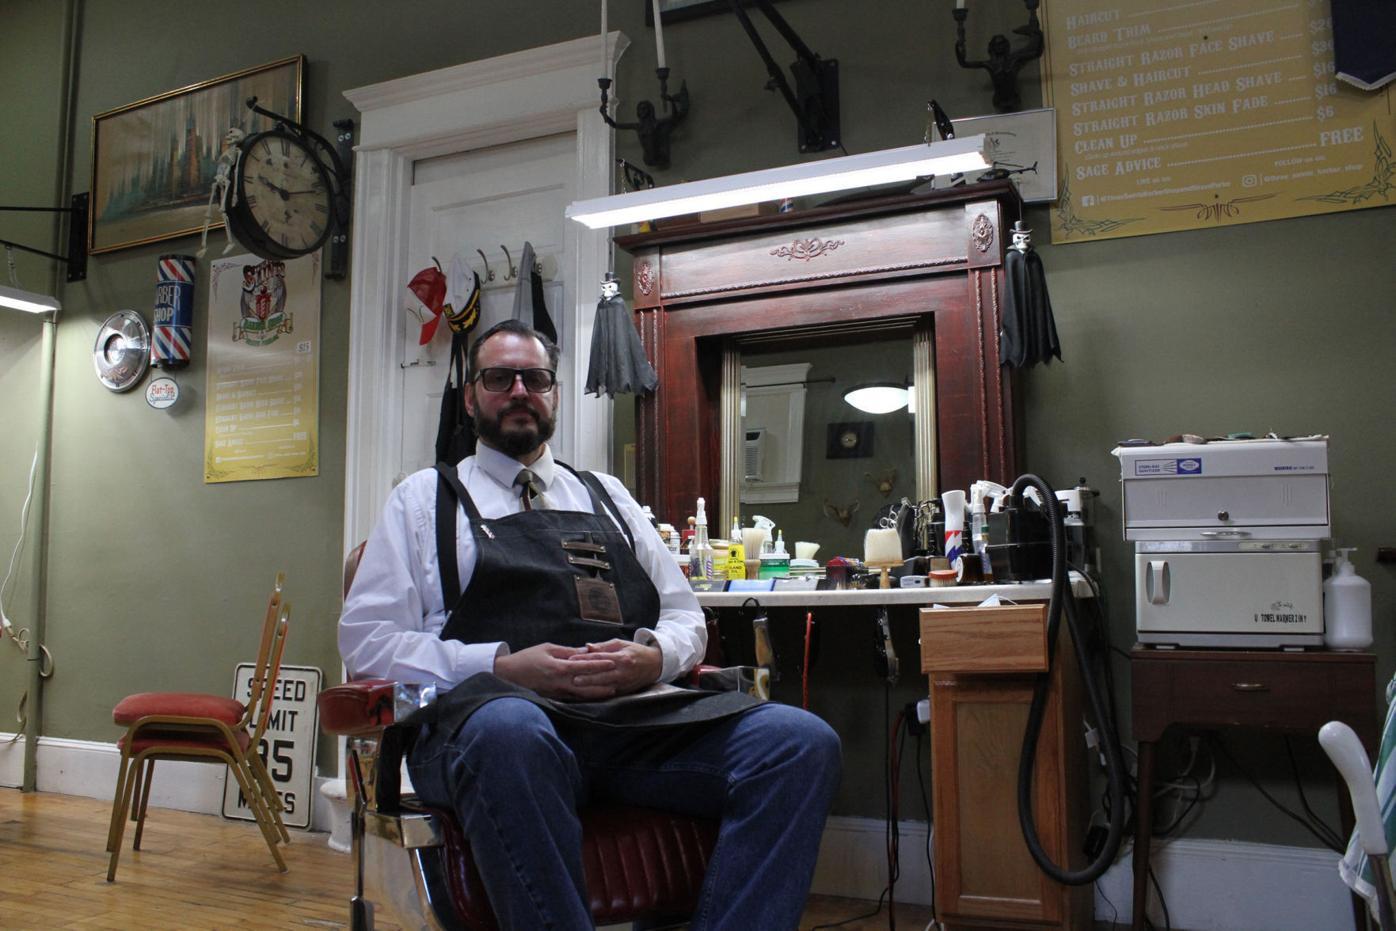 Three Saints Barber Shop & Shave Parlor owner Mike McAndrew